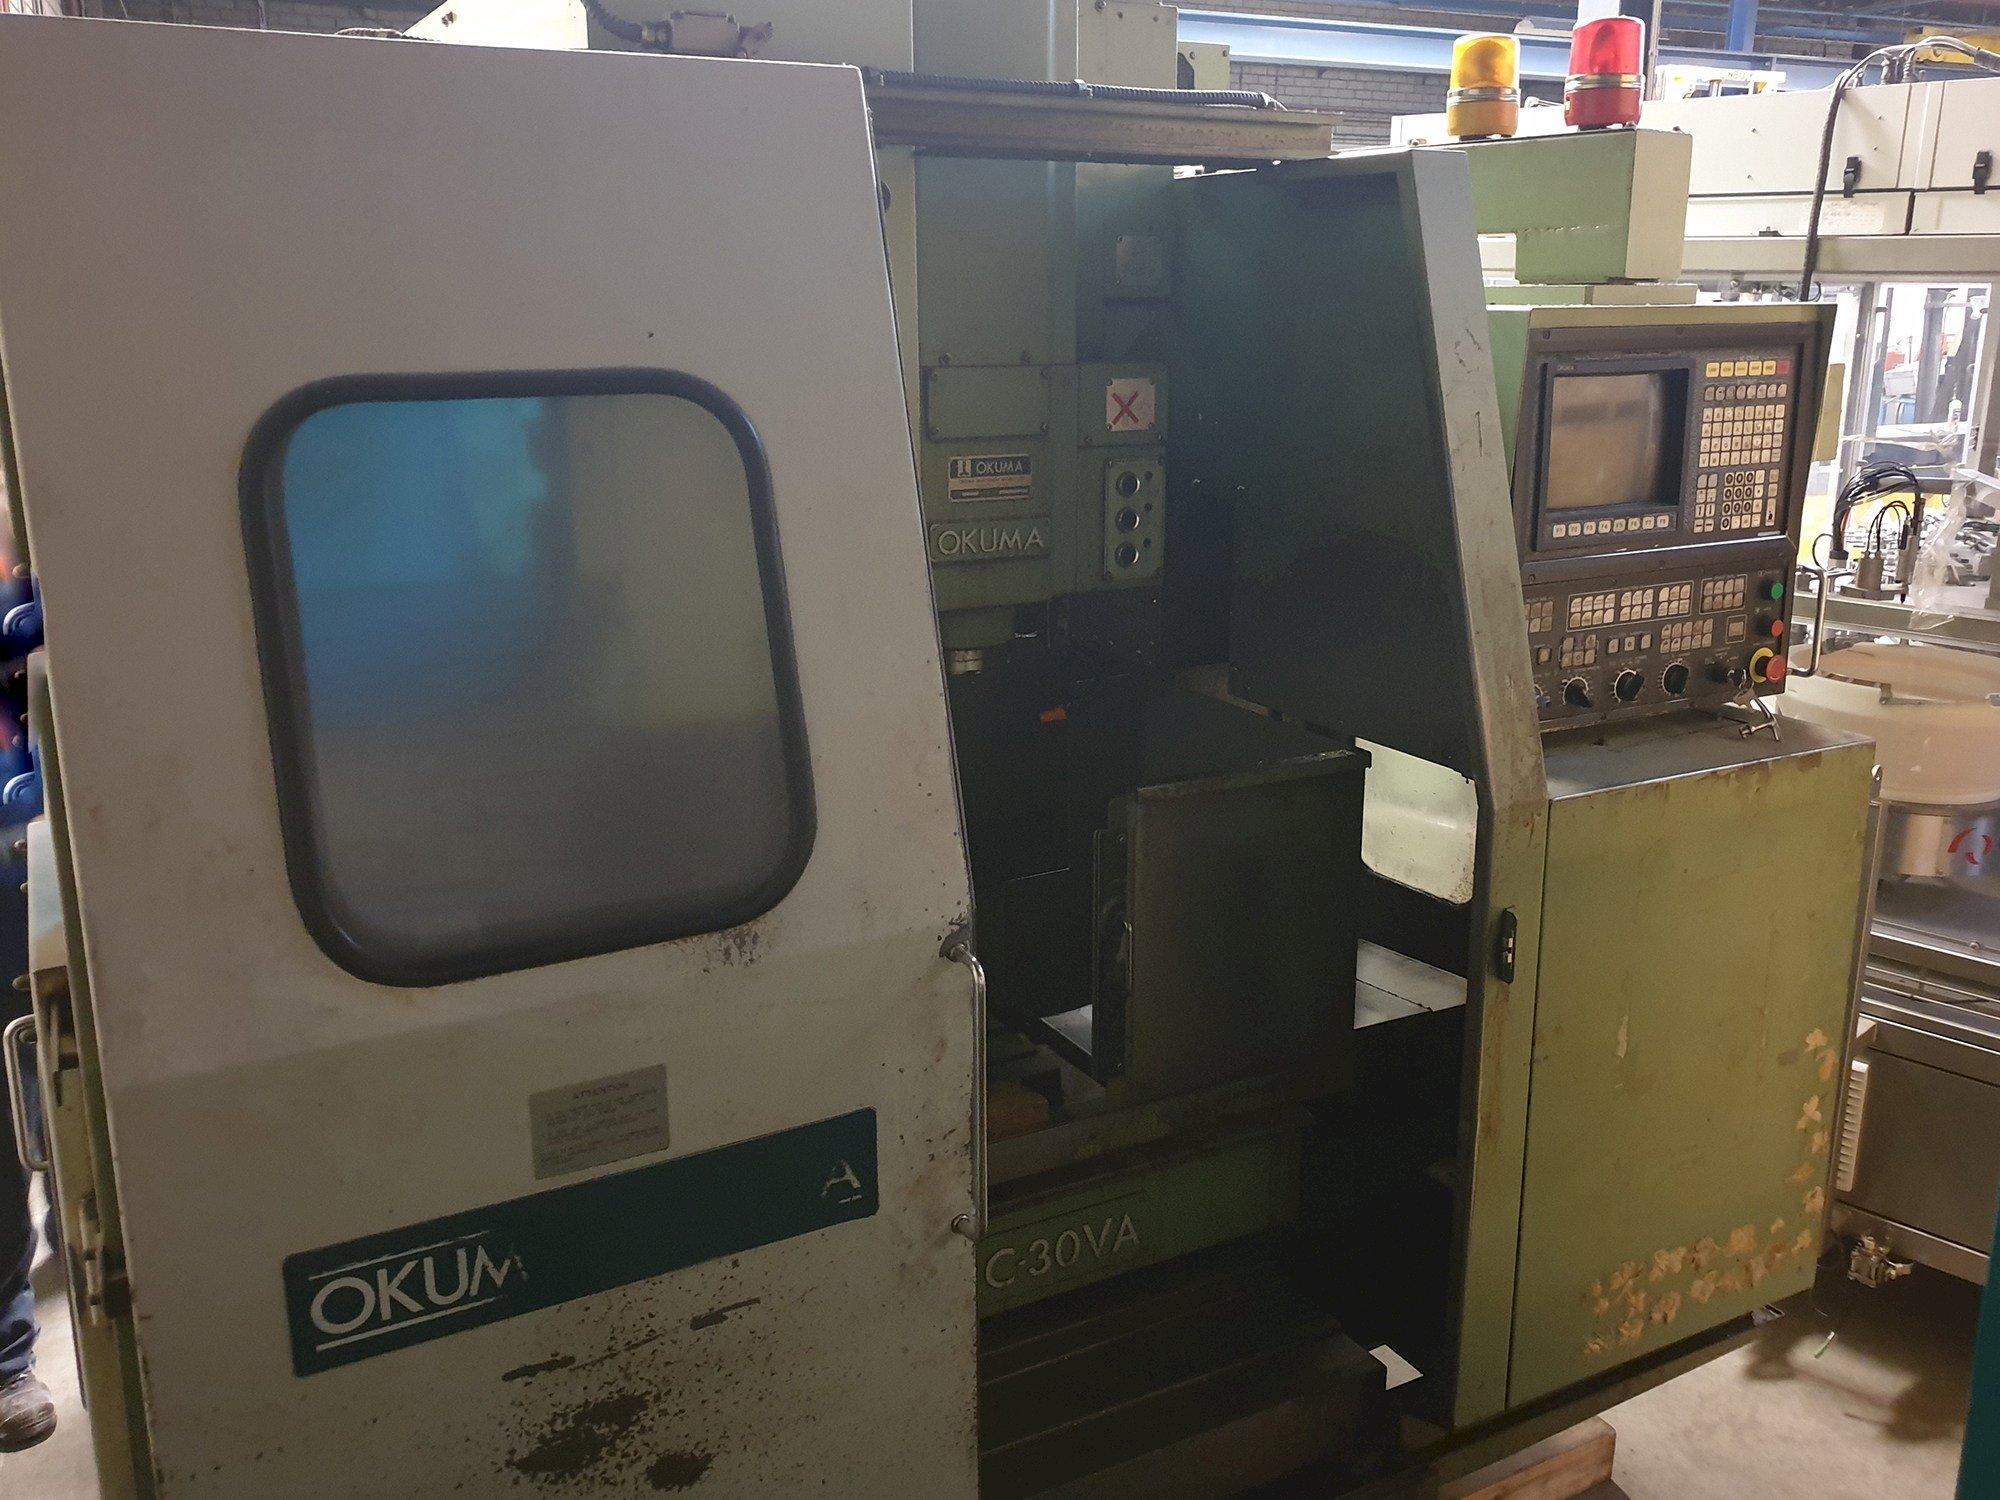 Okuma MC-30VA Vertical Machining Center